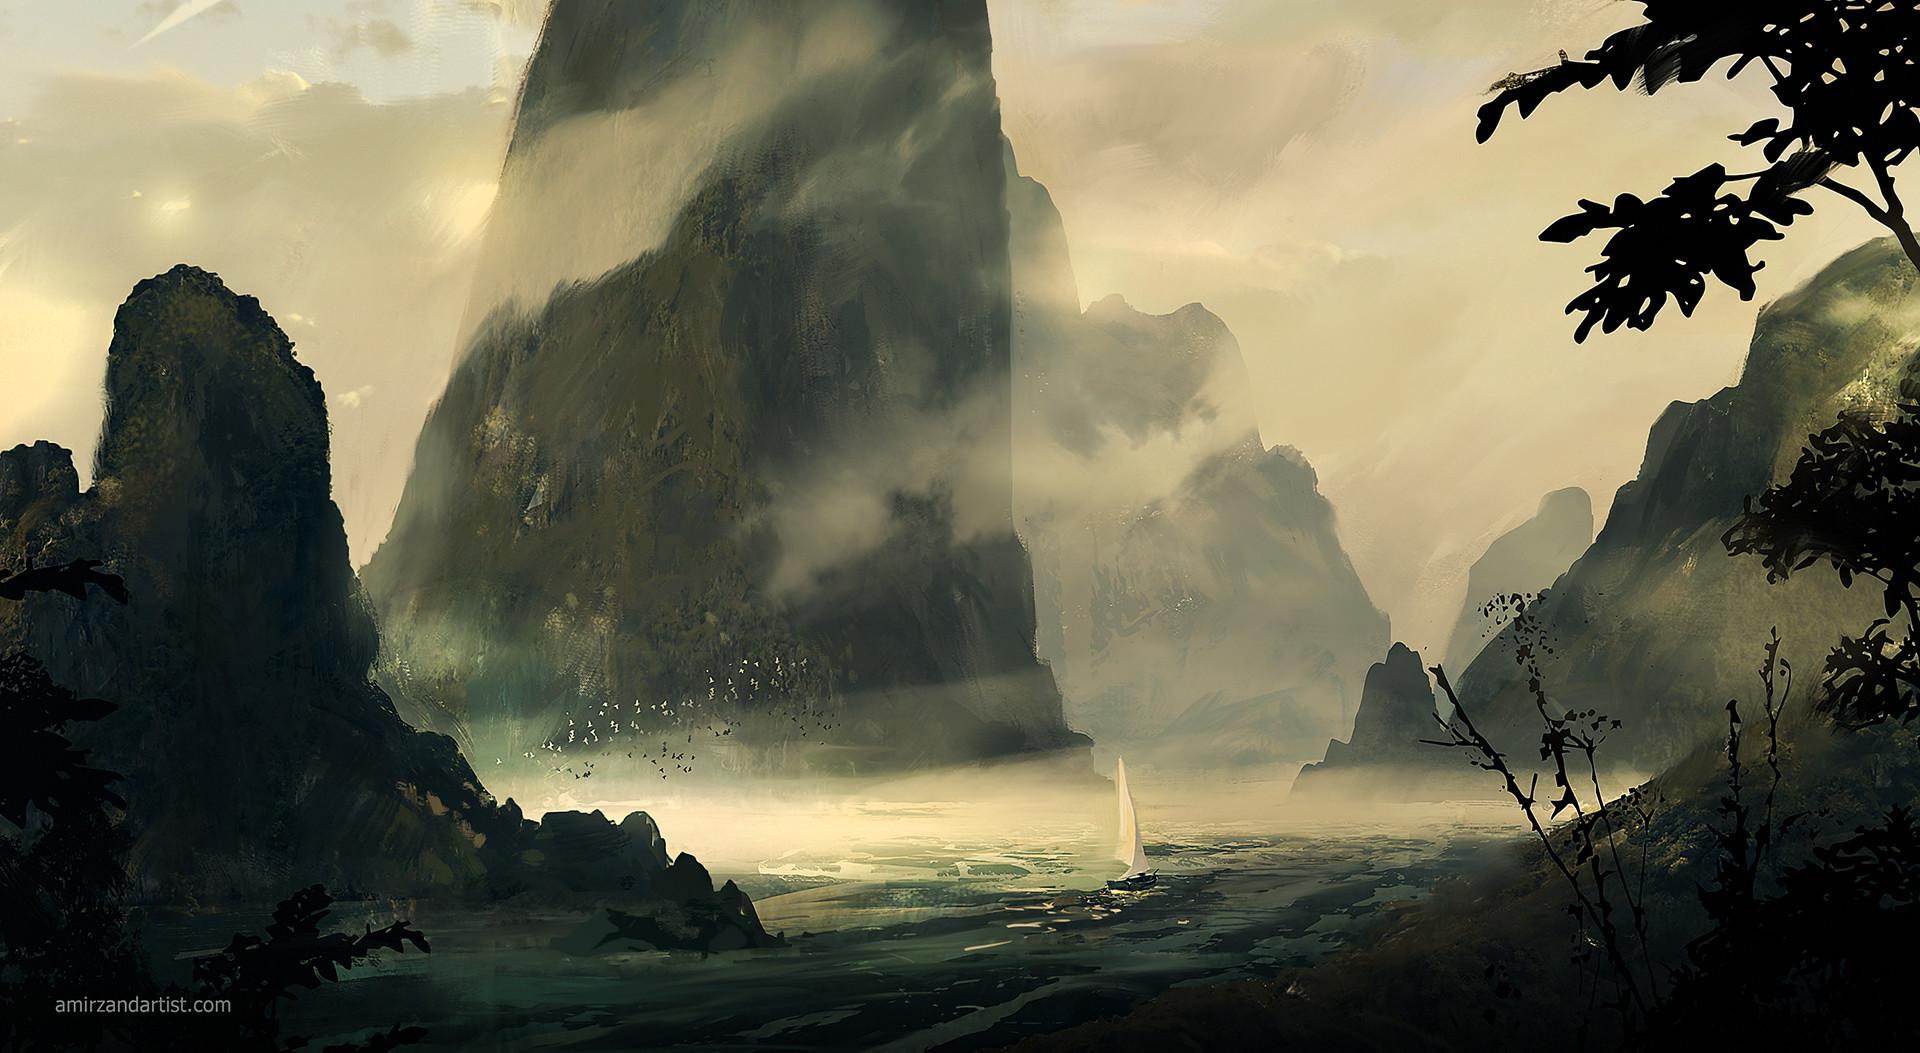 Amir zand artstation faraway land